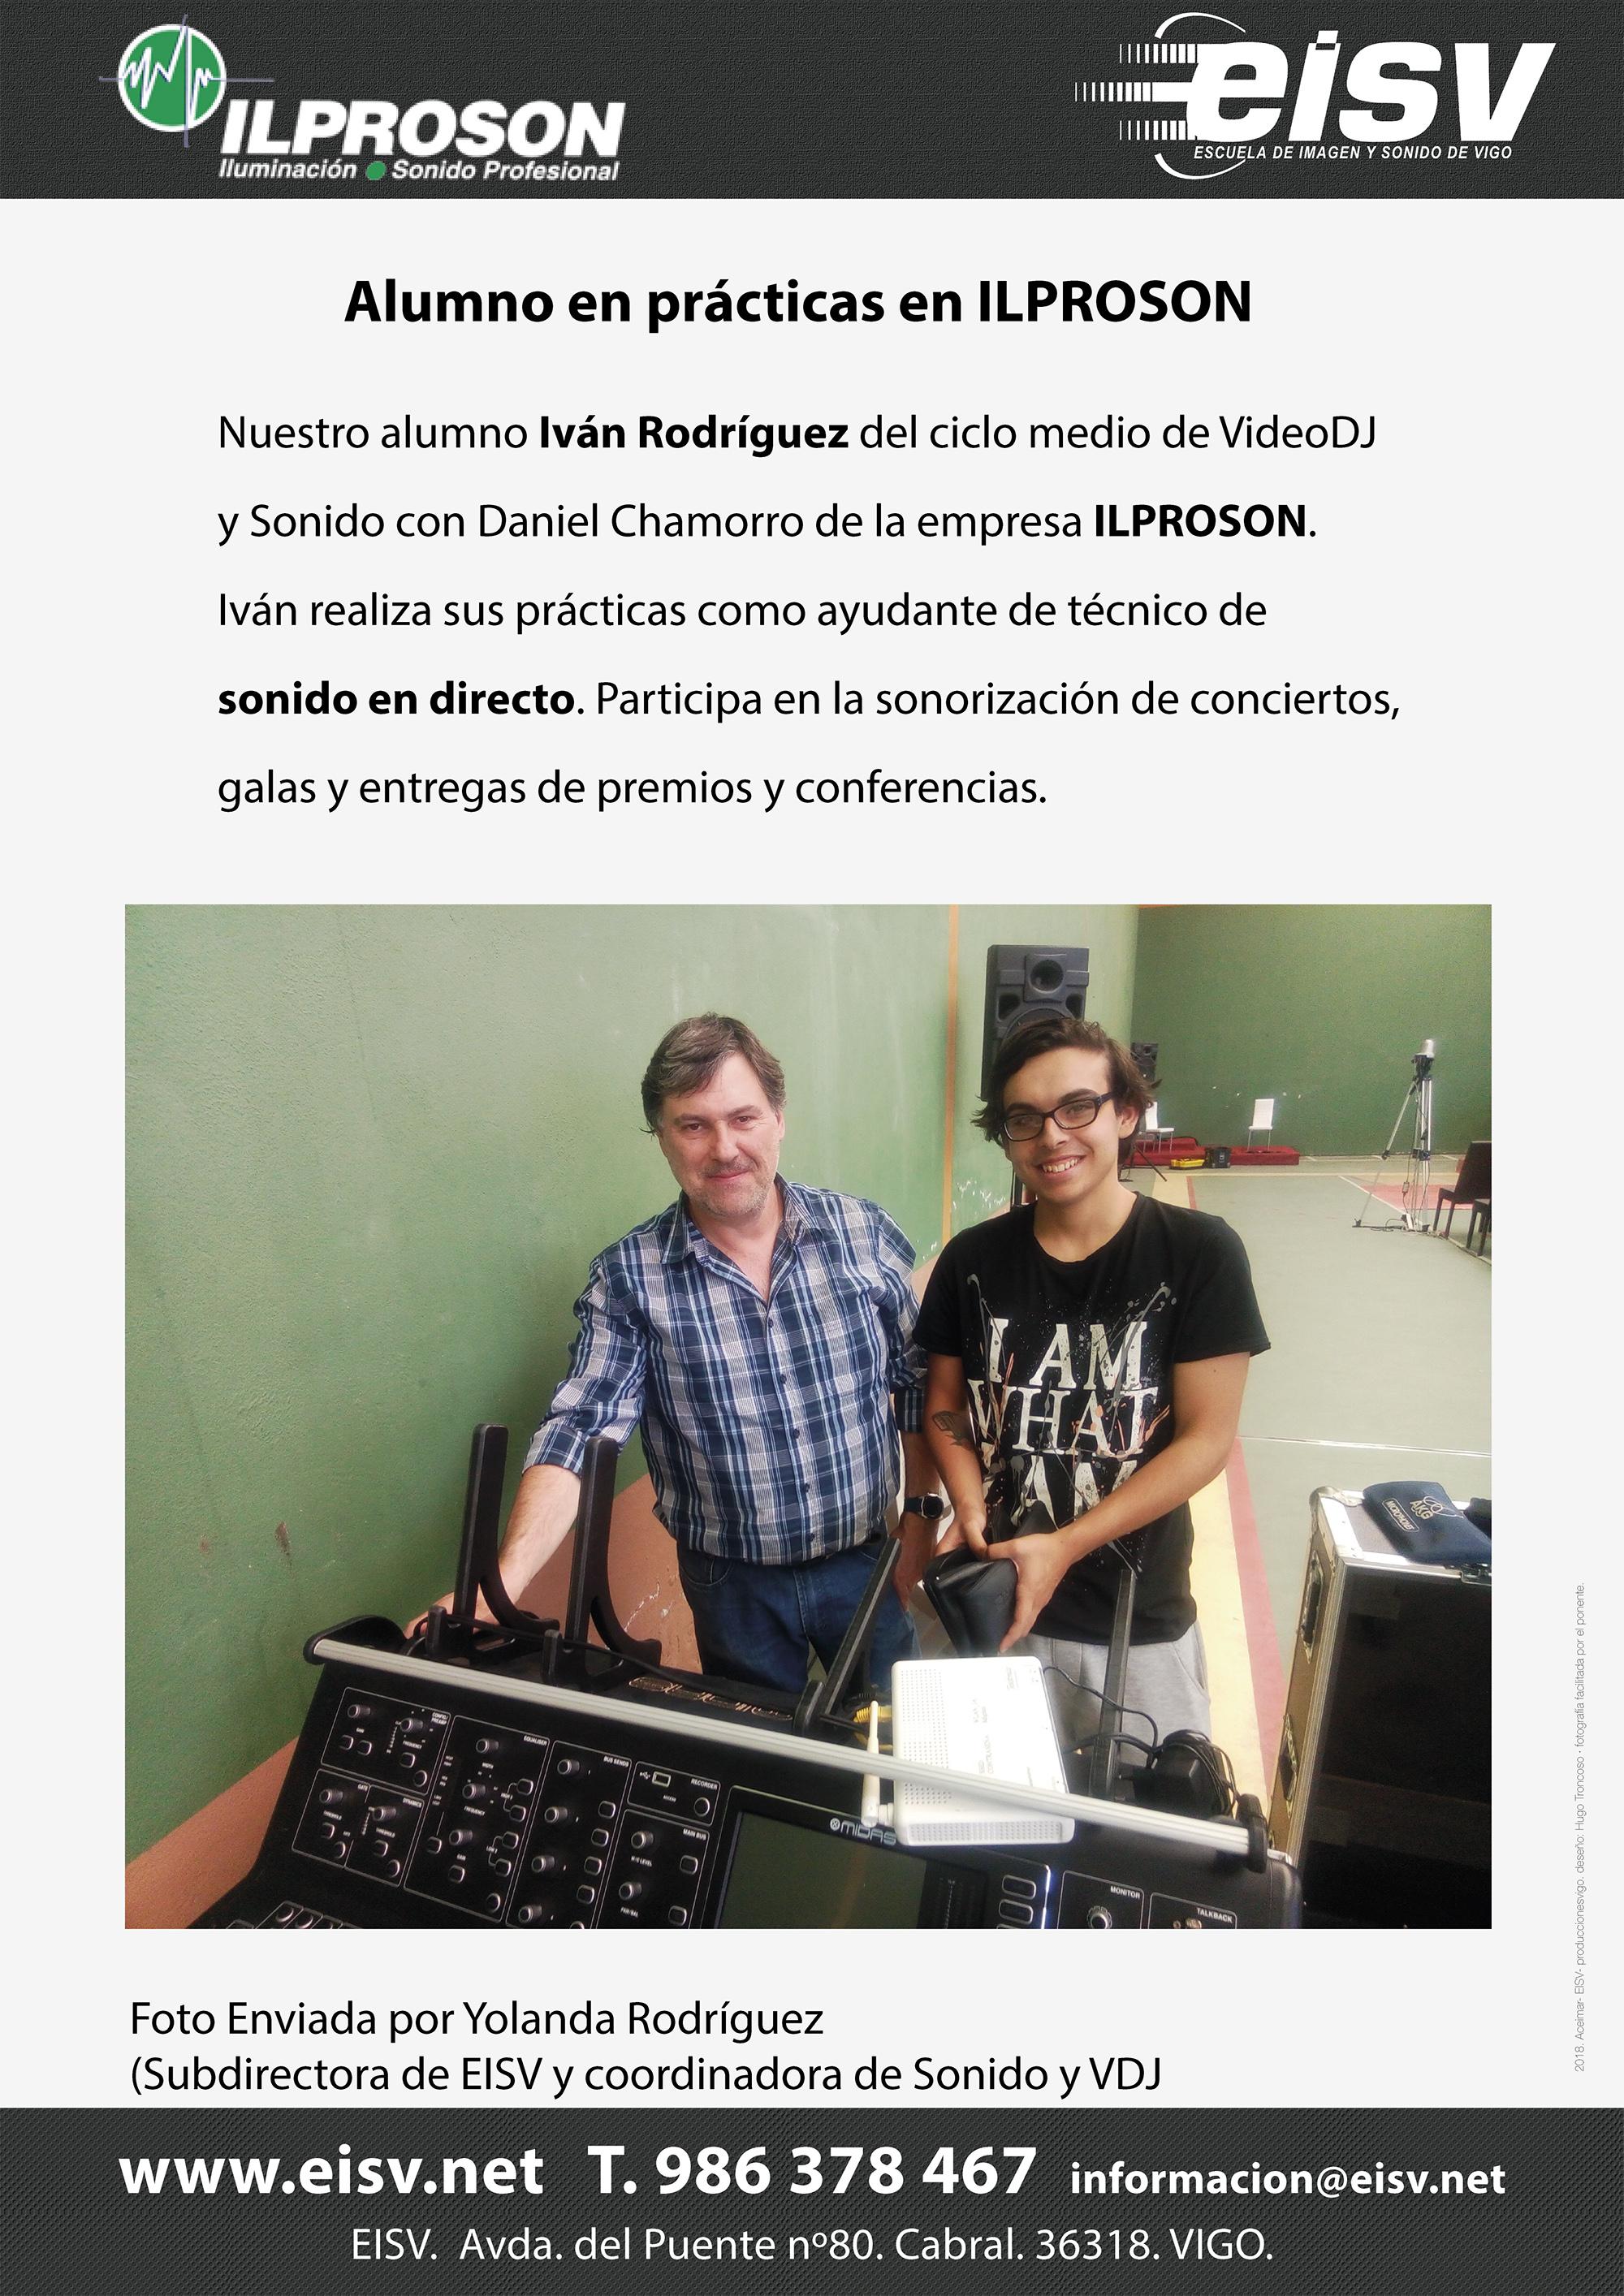 Iván Rodriguez practicas FCT empresa ILPROSON